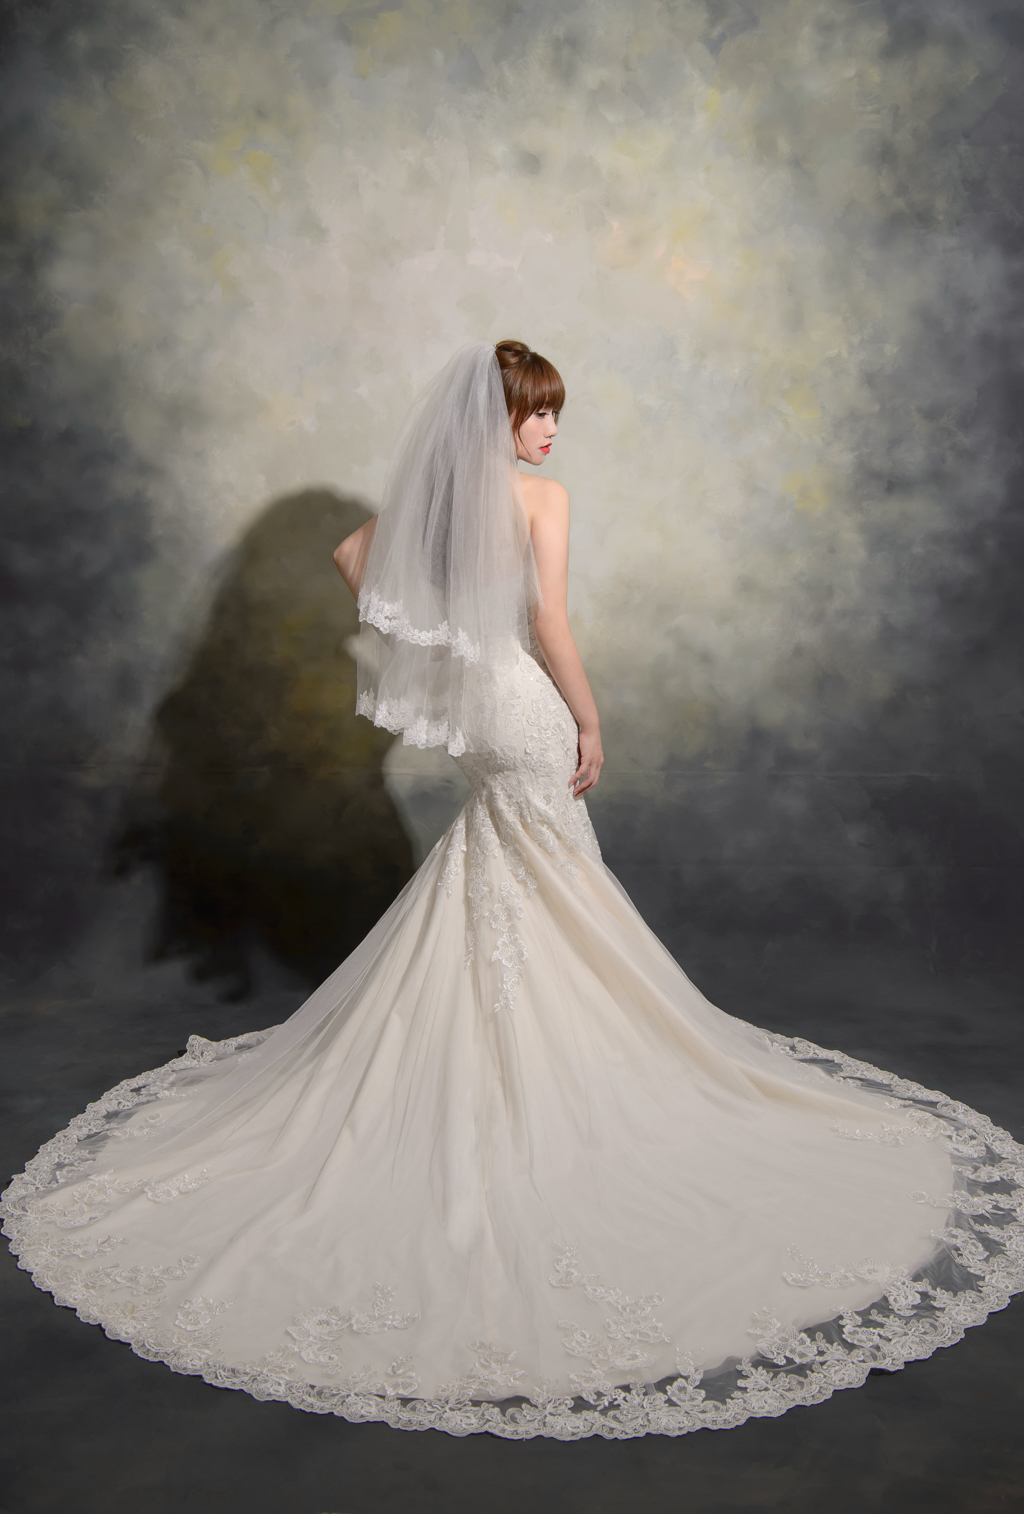 婚攝小勇, 小寶團隊, 自助婚紗, niniko, wedding day-012